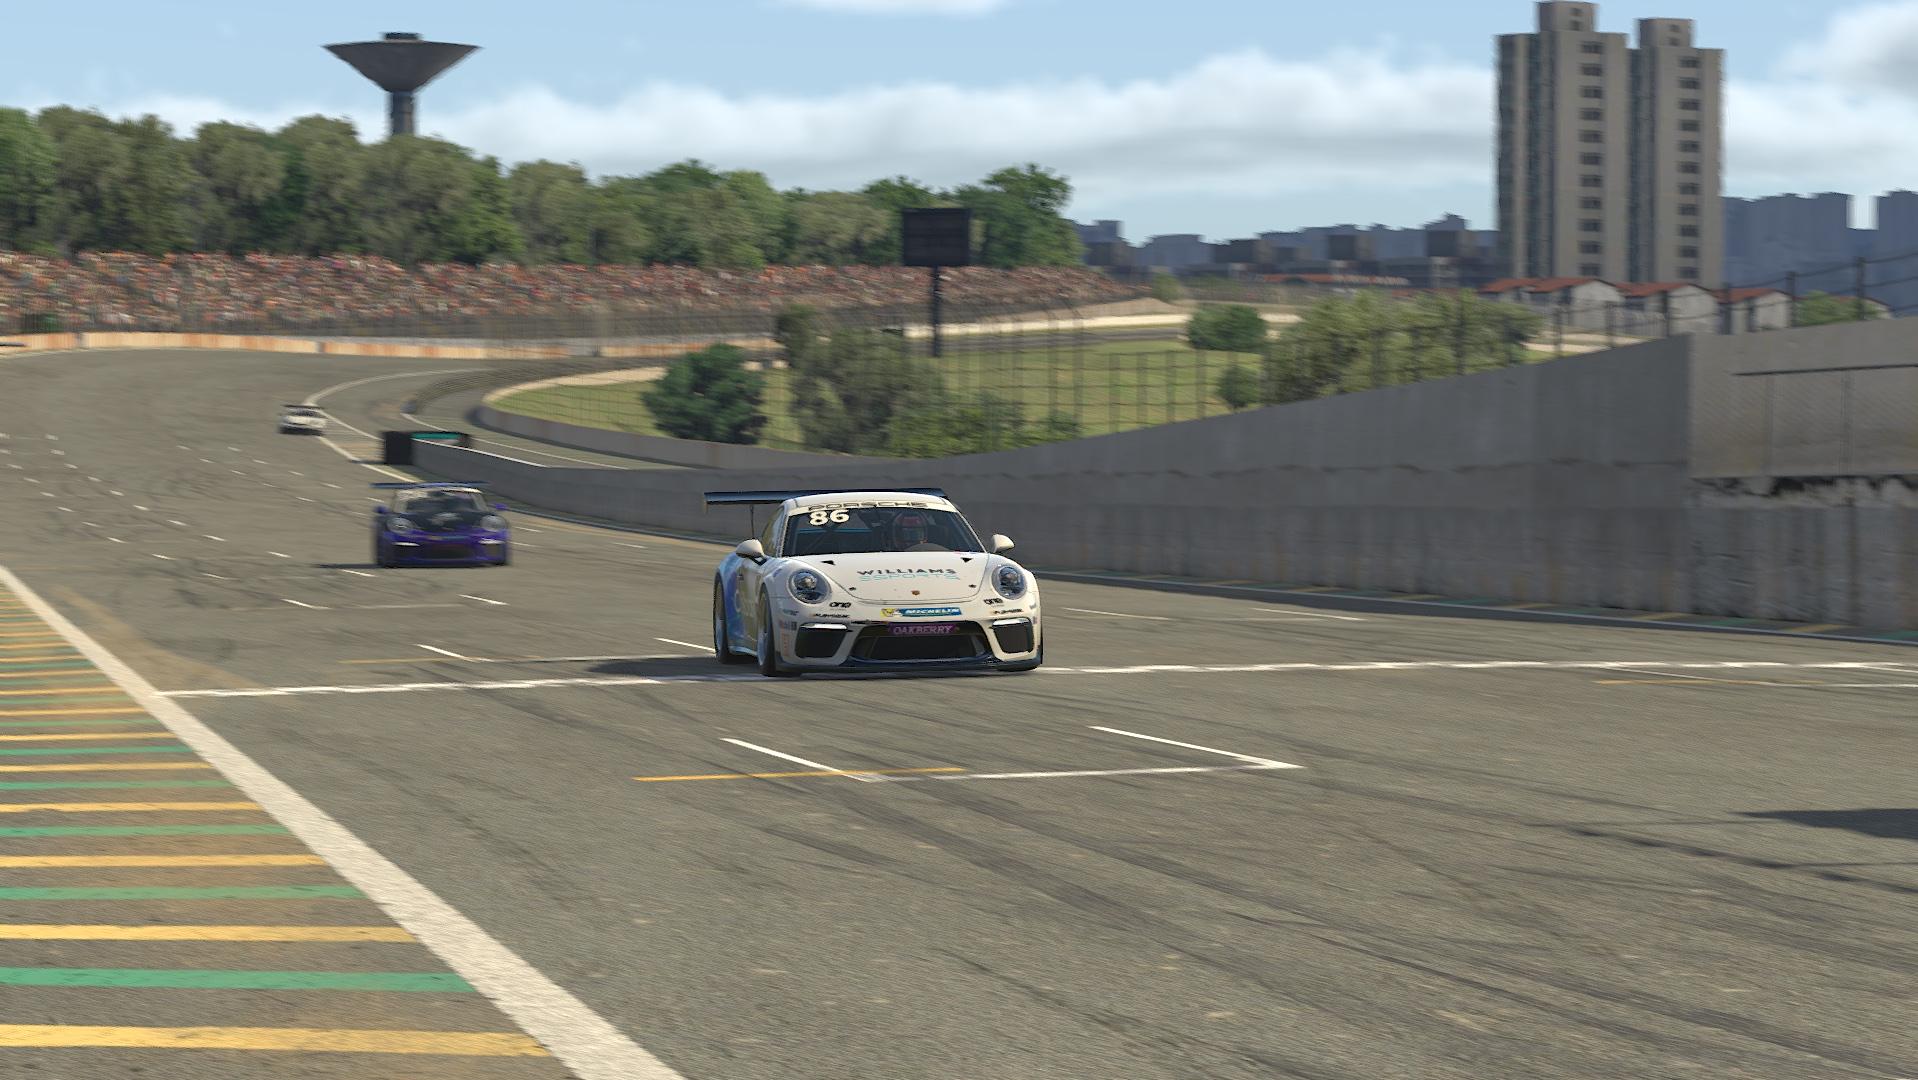 Photo of Vr-Racing : Agustín Canapino ganha a Corrida das Estrelas da Porsche Cup em automobilismo virtual